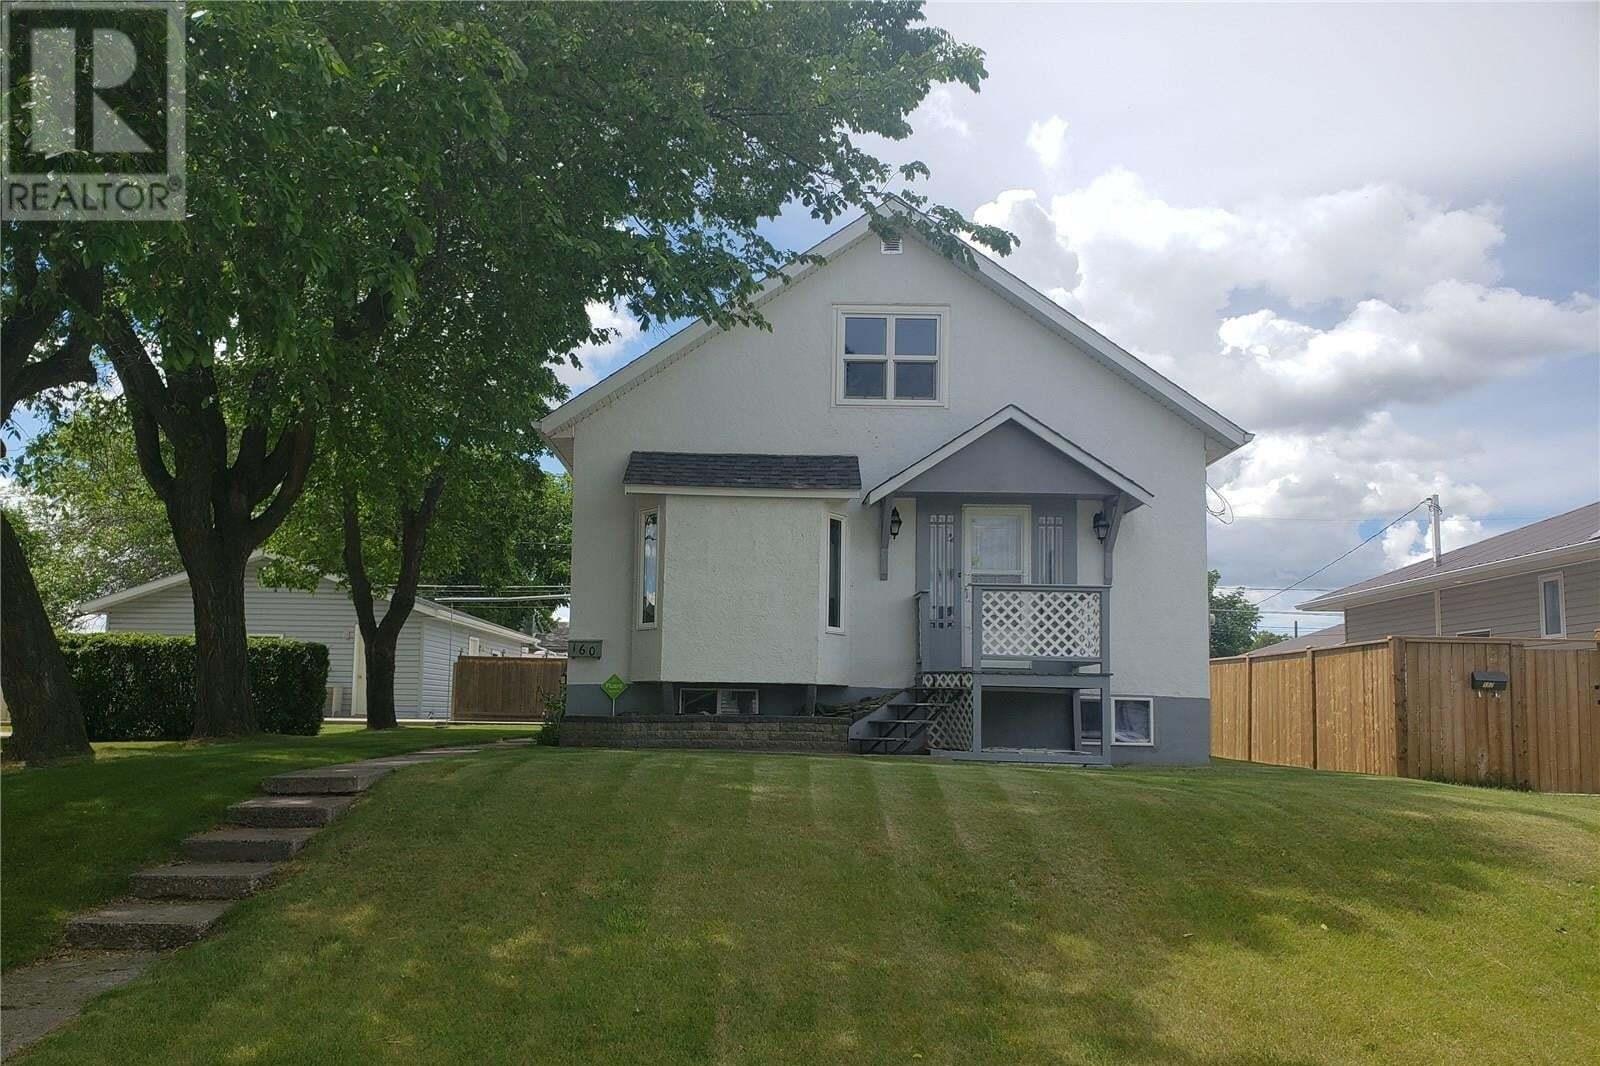 House for sale at 160 4th Ave SE Swift Current Saskatchewan - MLS: SK827601